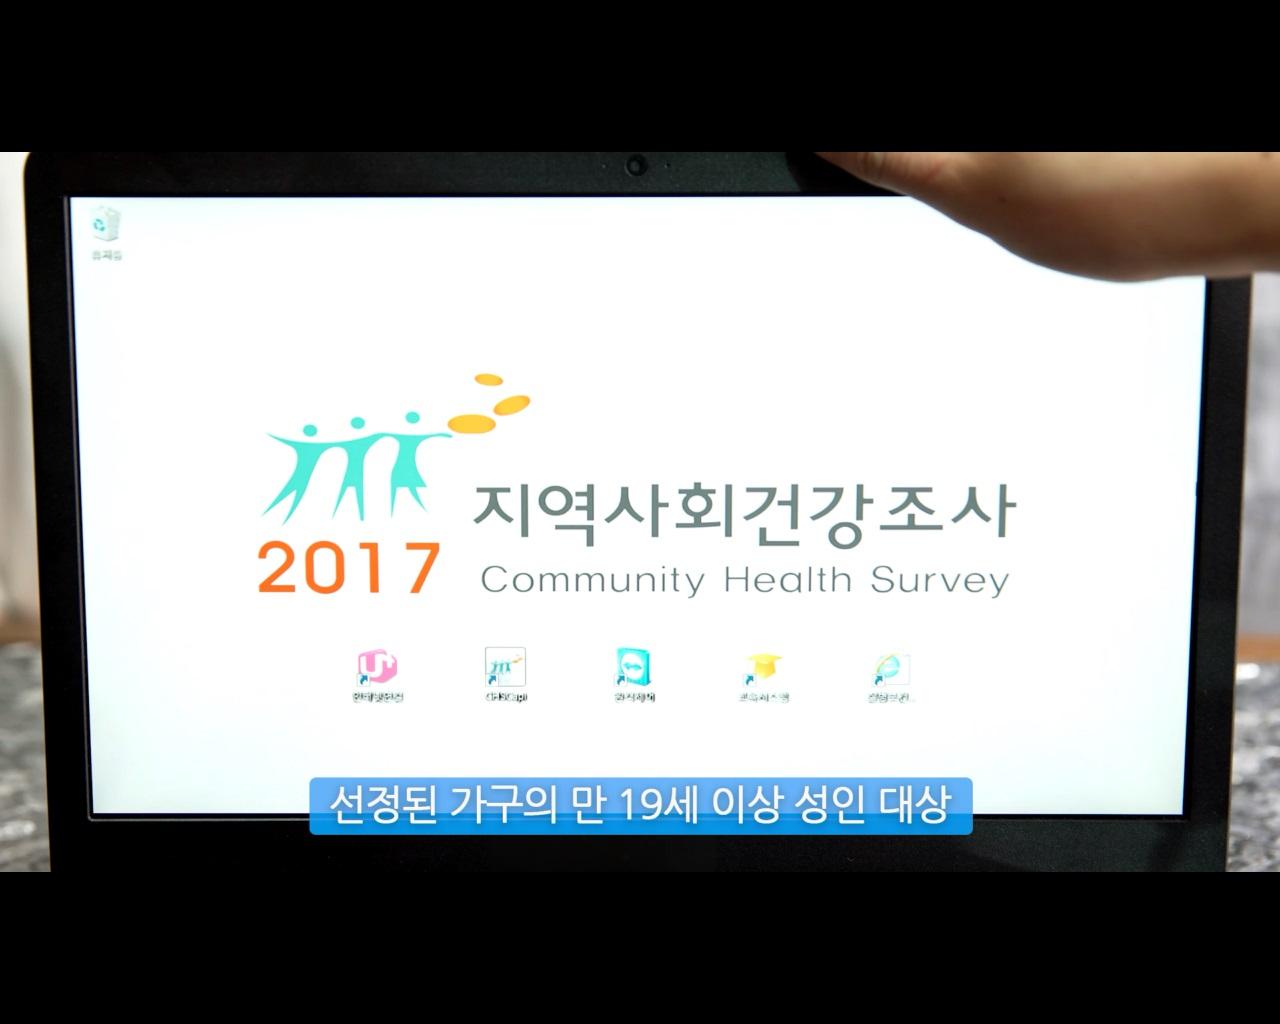 http://58.225.10.93/Media/EBN/EBNP0012/jiyu.jpg